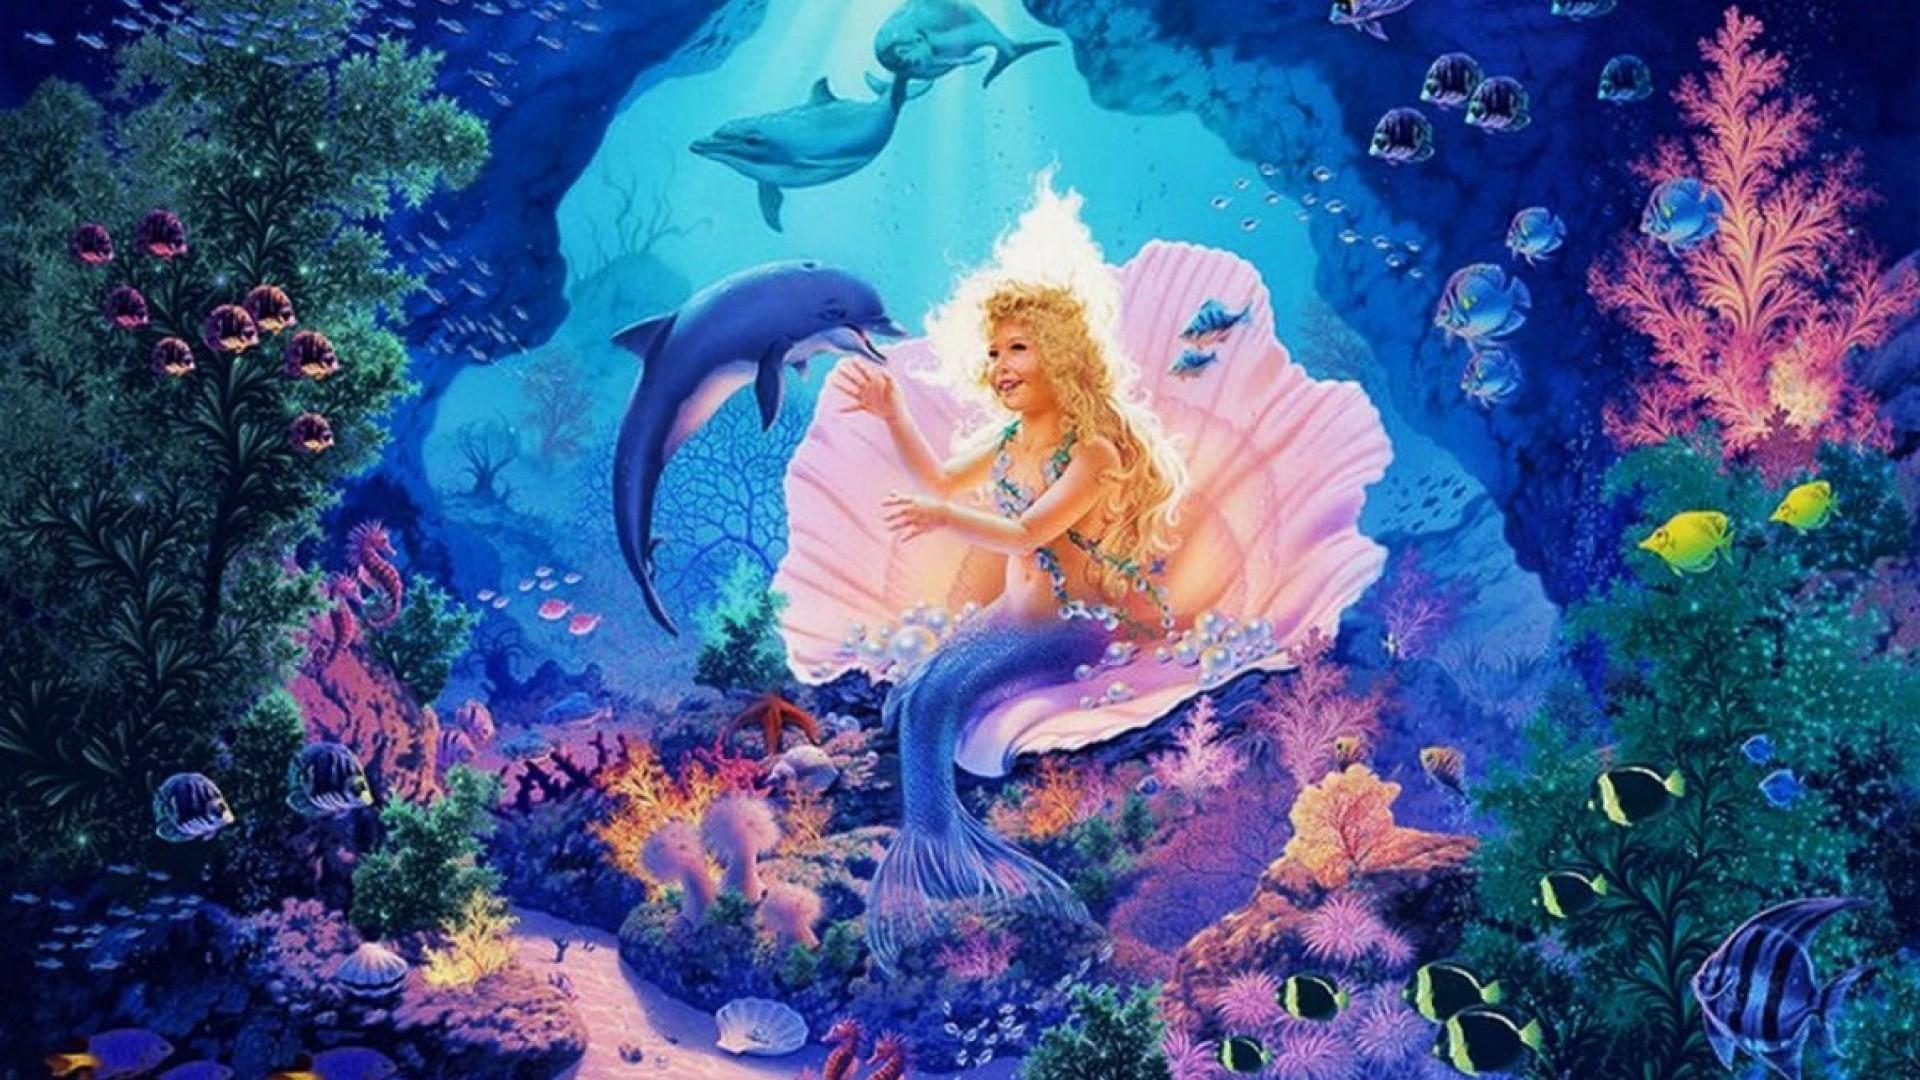 Mermaid Wallpaper 64 Pictures